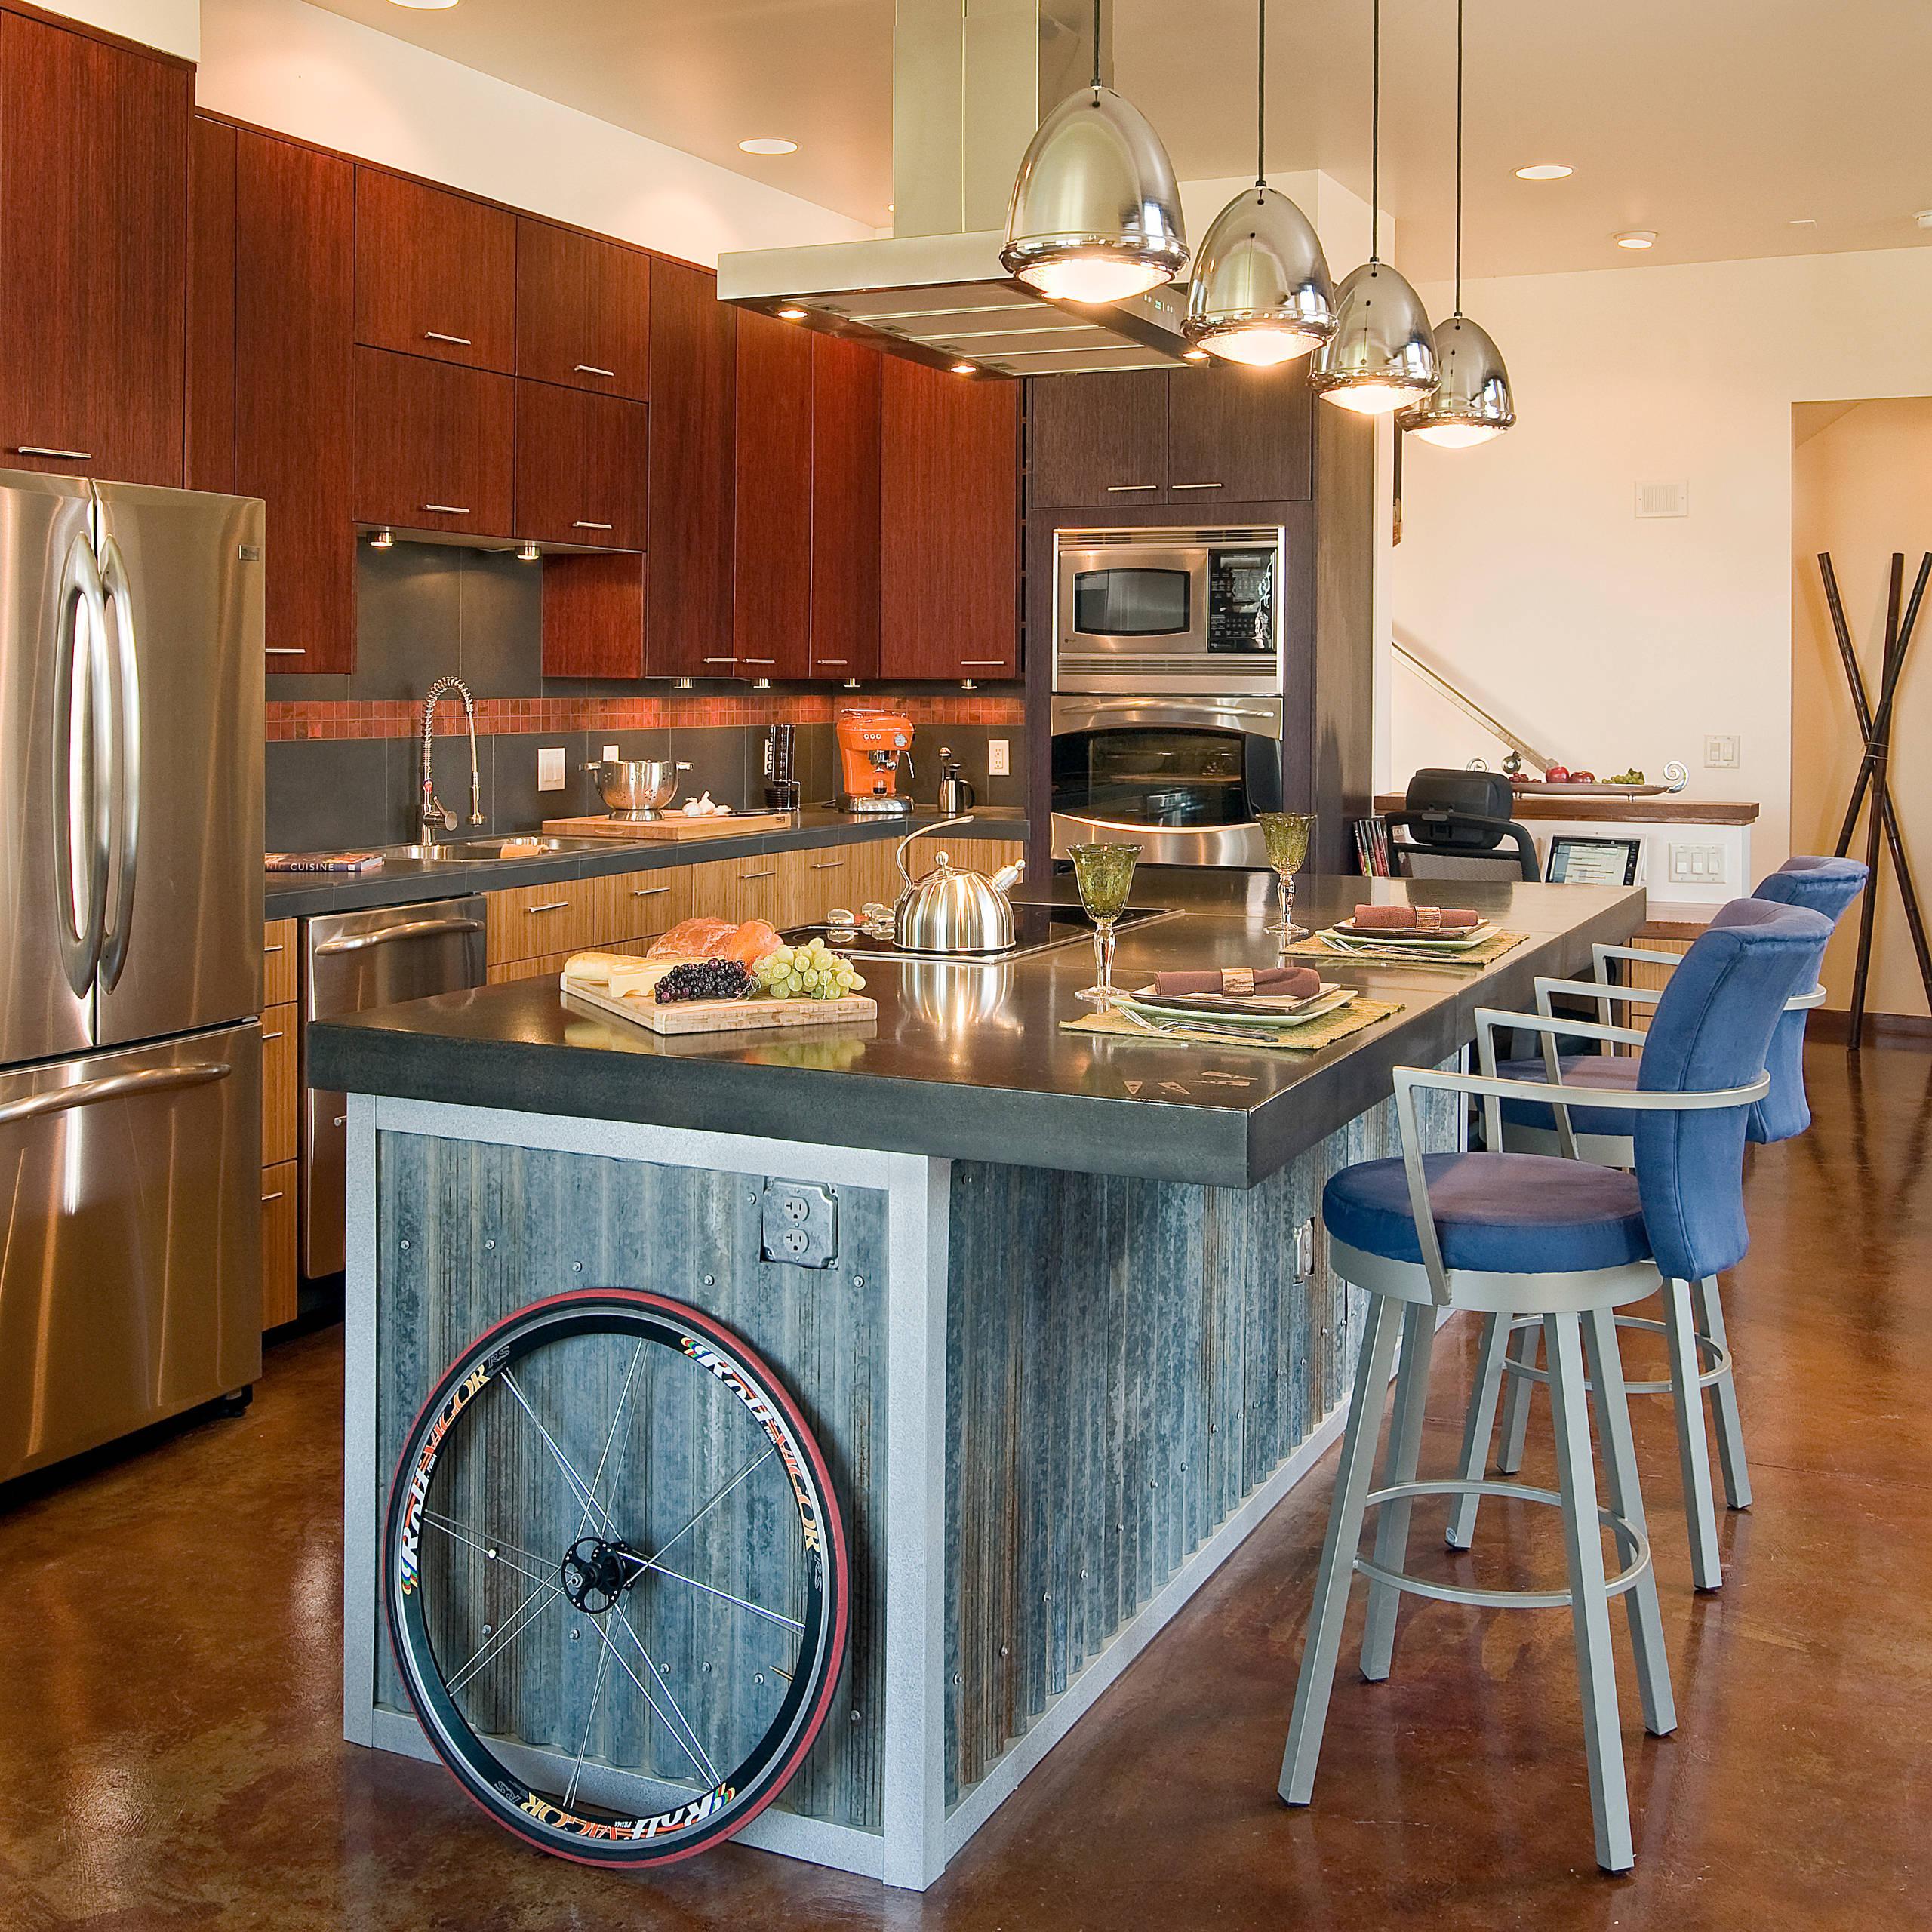 Galvanized Corrugated Metal Kitchen Ideas Photos Houzz